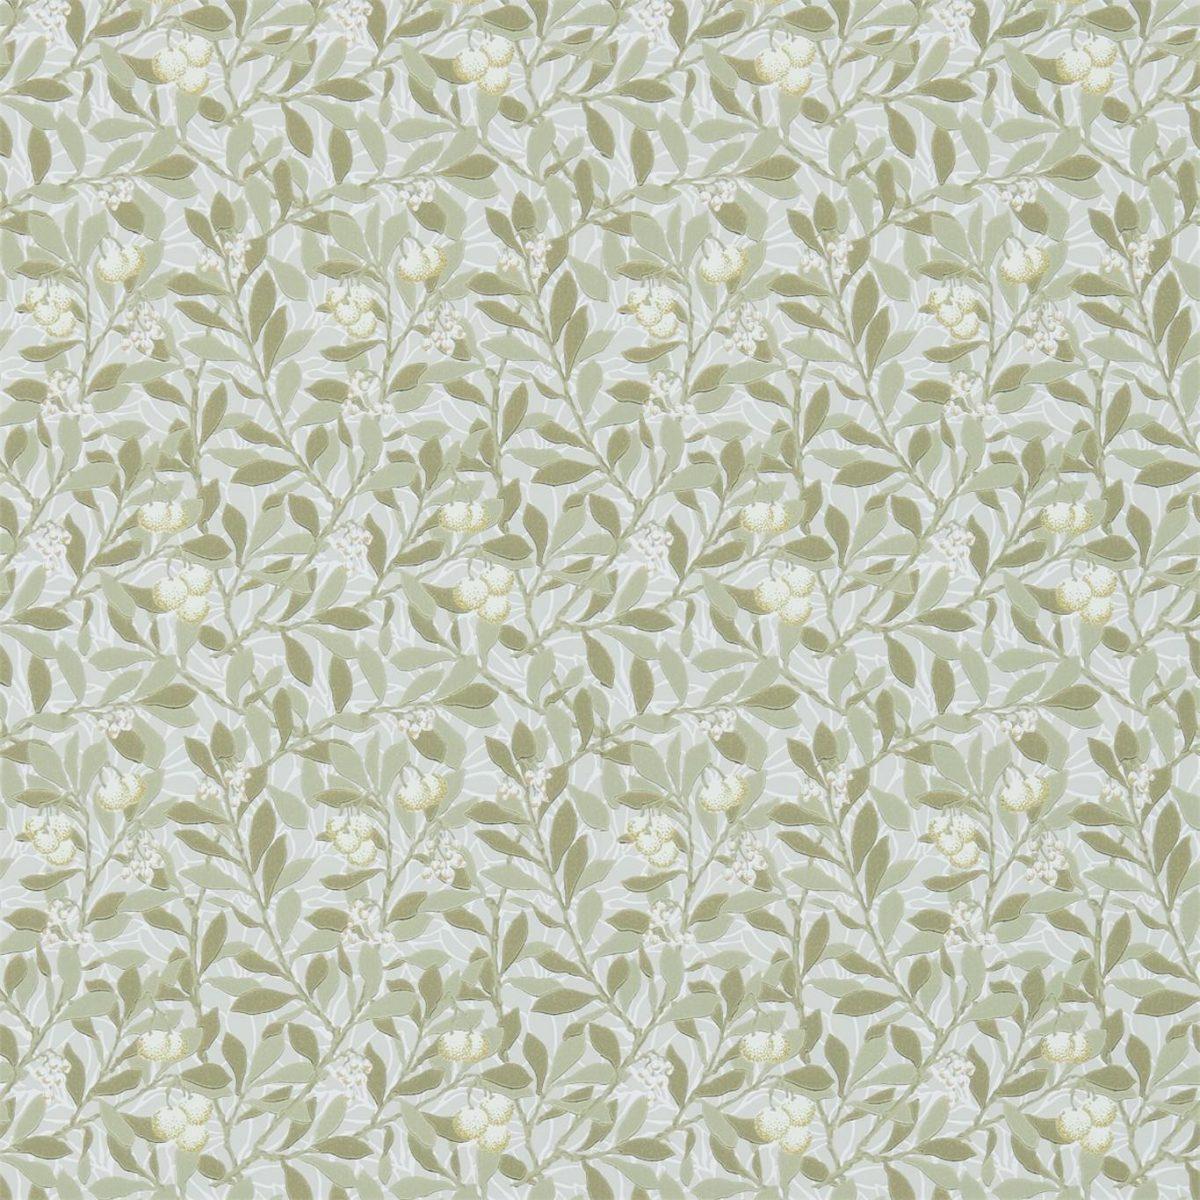 Morris & Co Tapet Arbutus Linen/Cream